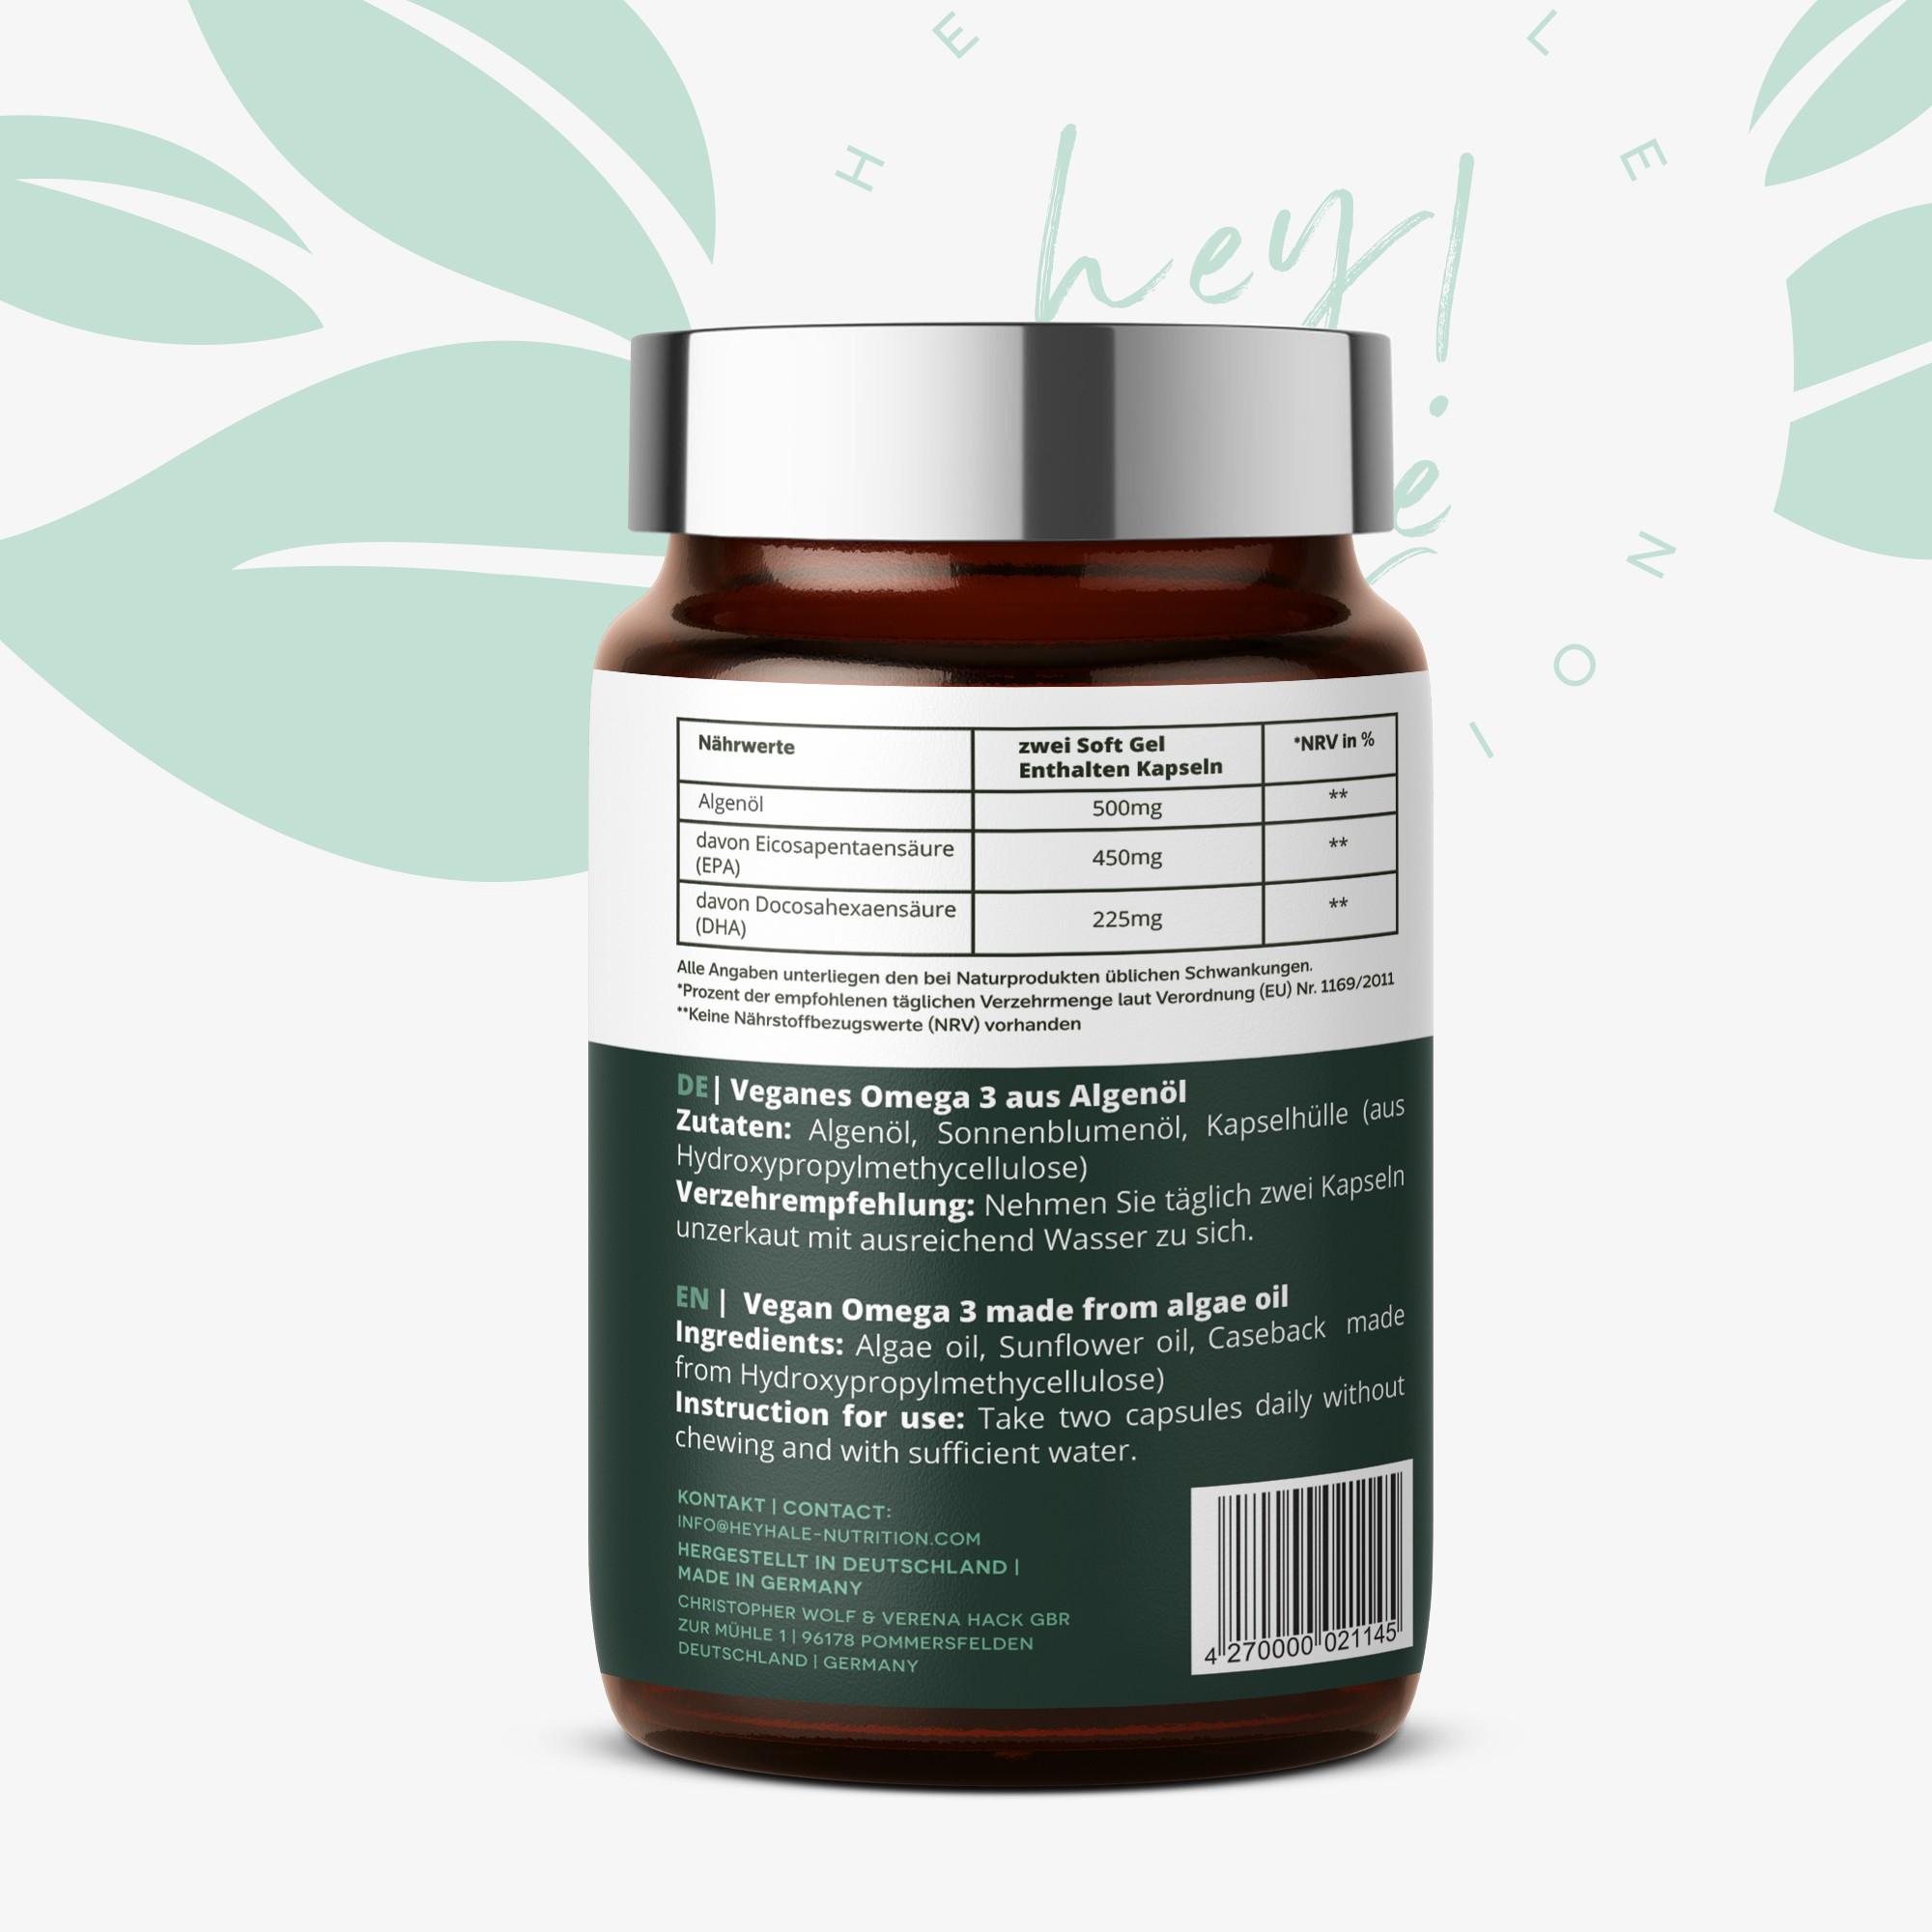 Label for vegan omega 3 for the brand heyhale-nutrition